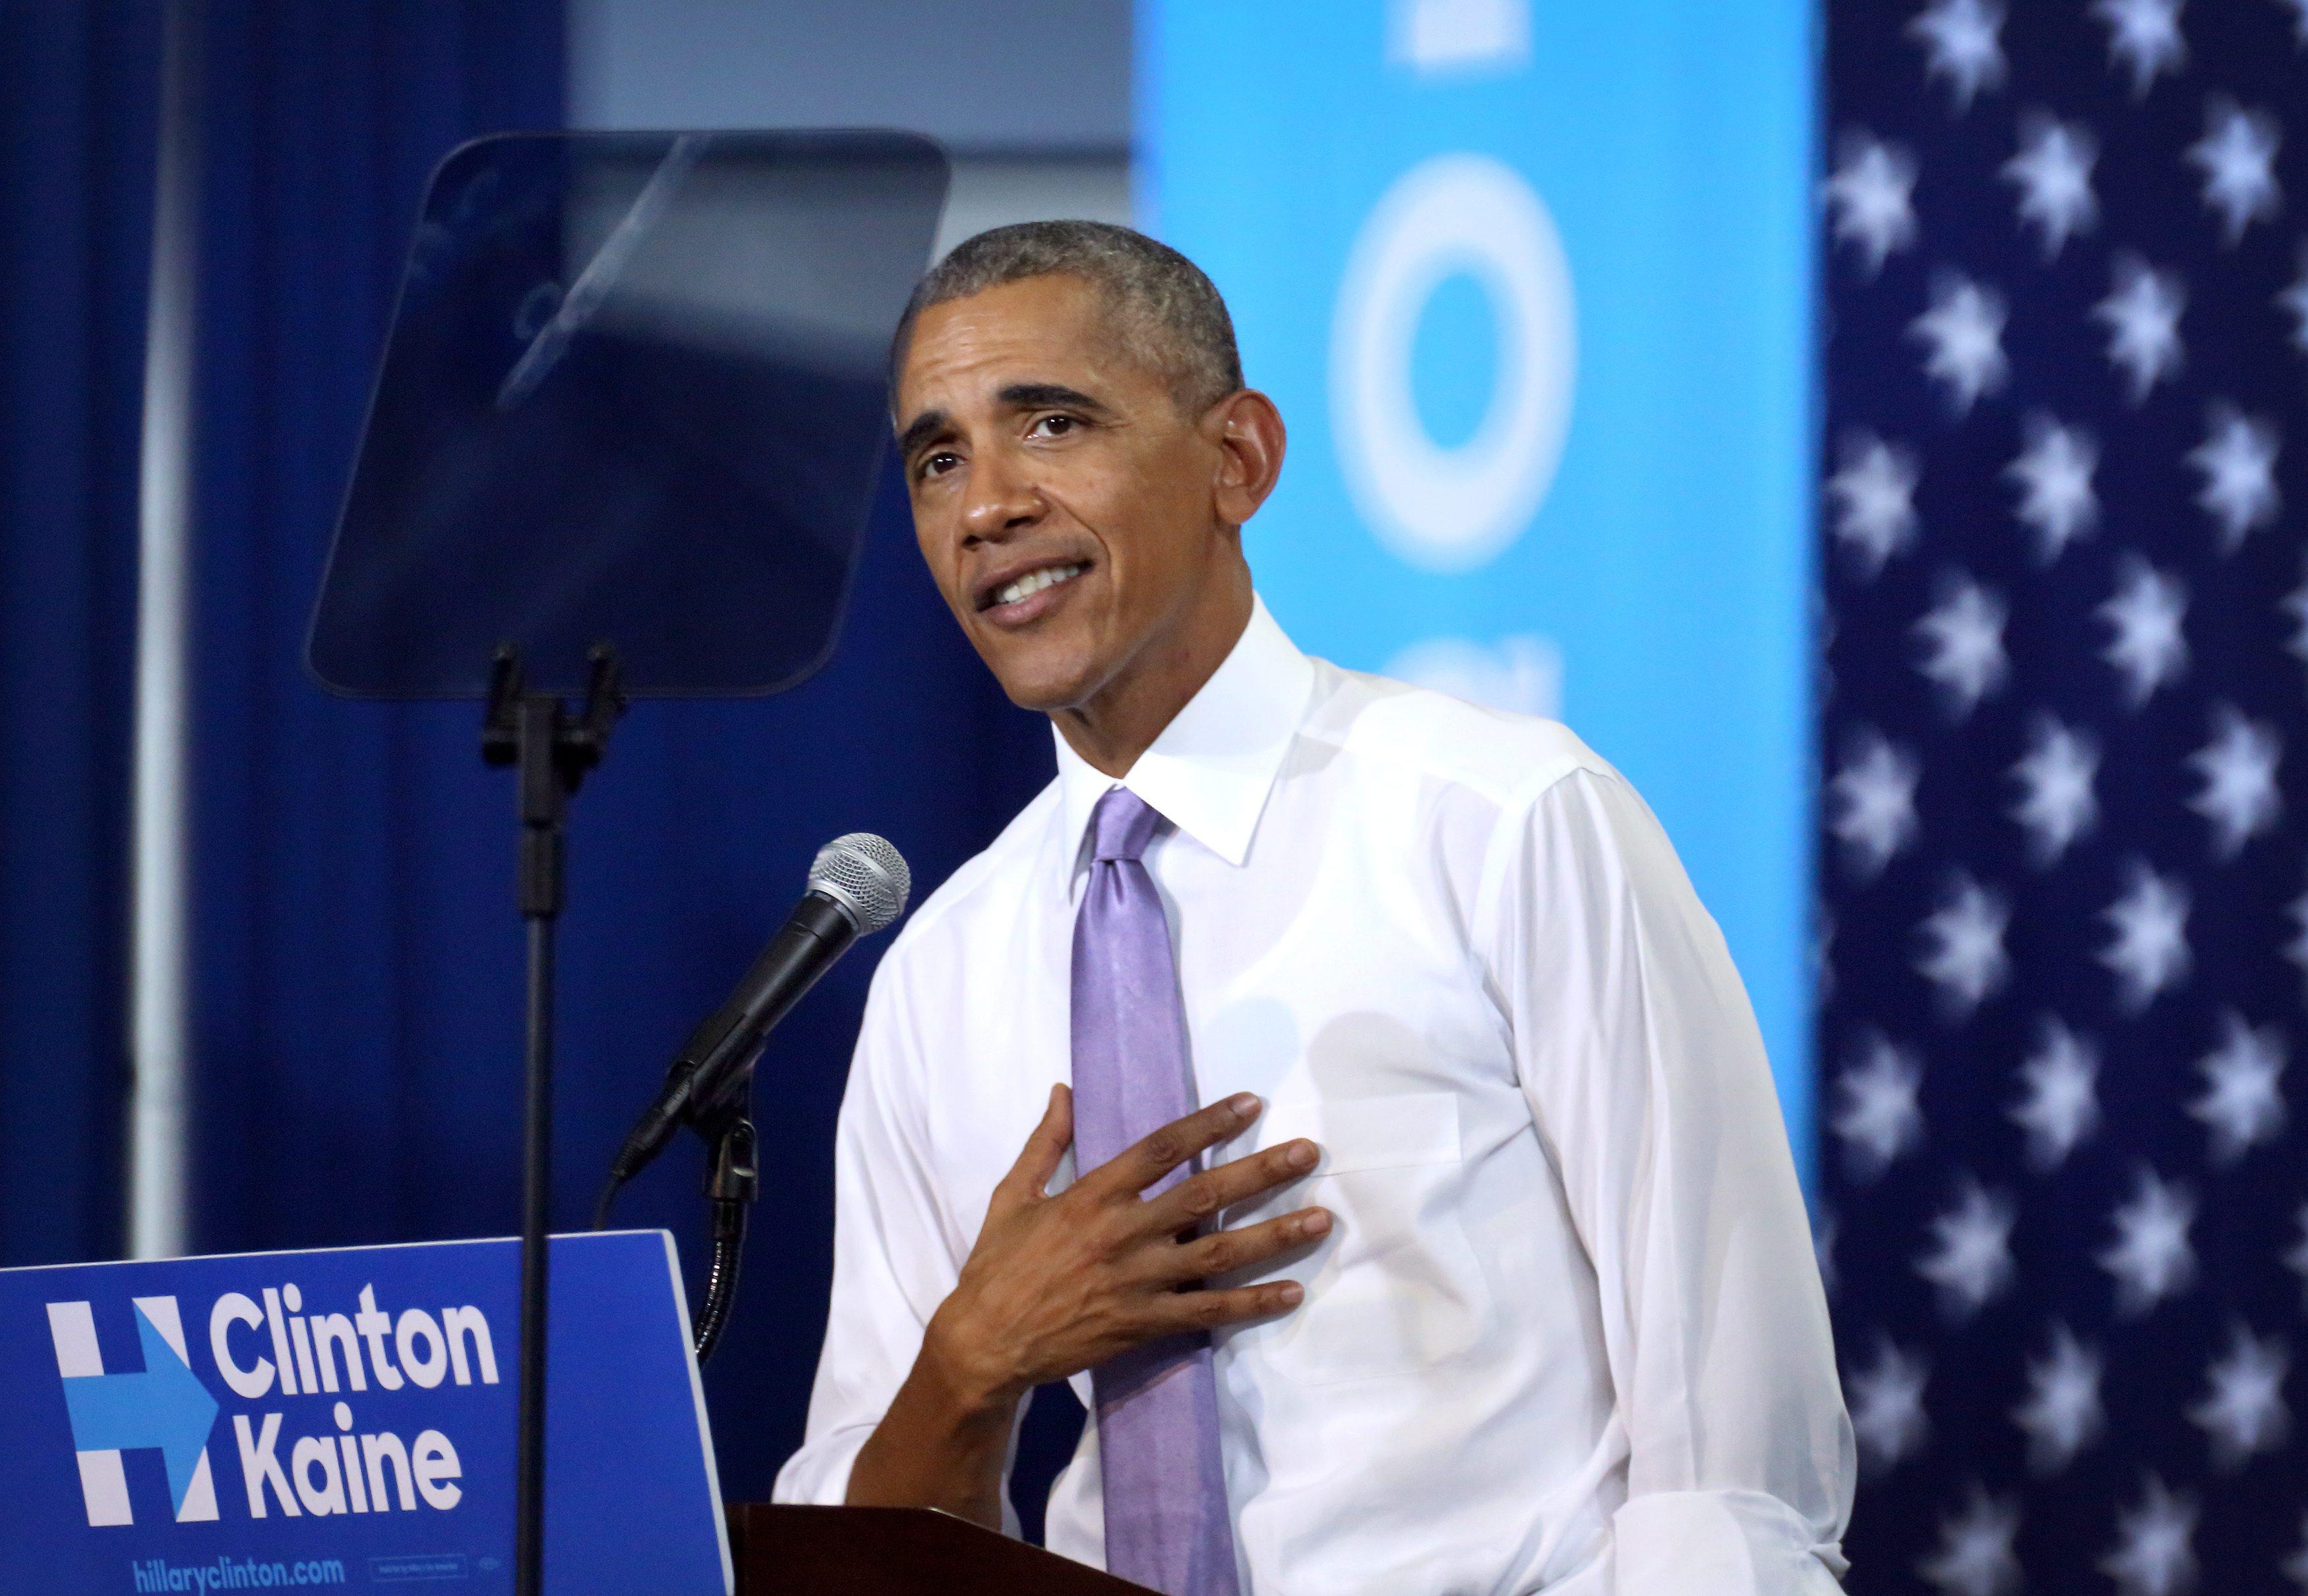 Prezydent Barack Obama wspiera Hillary Clinton podczas jej kampanii. Fot. PAP/EPA/CRISTOBAL HERRERA